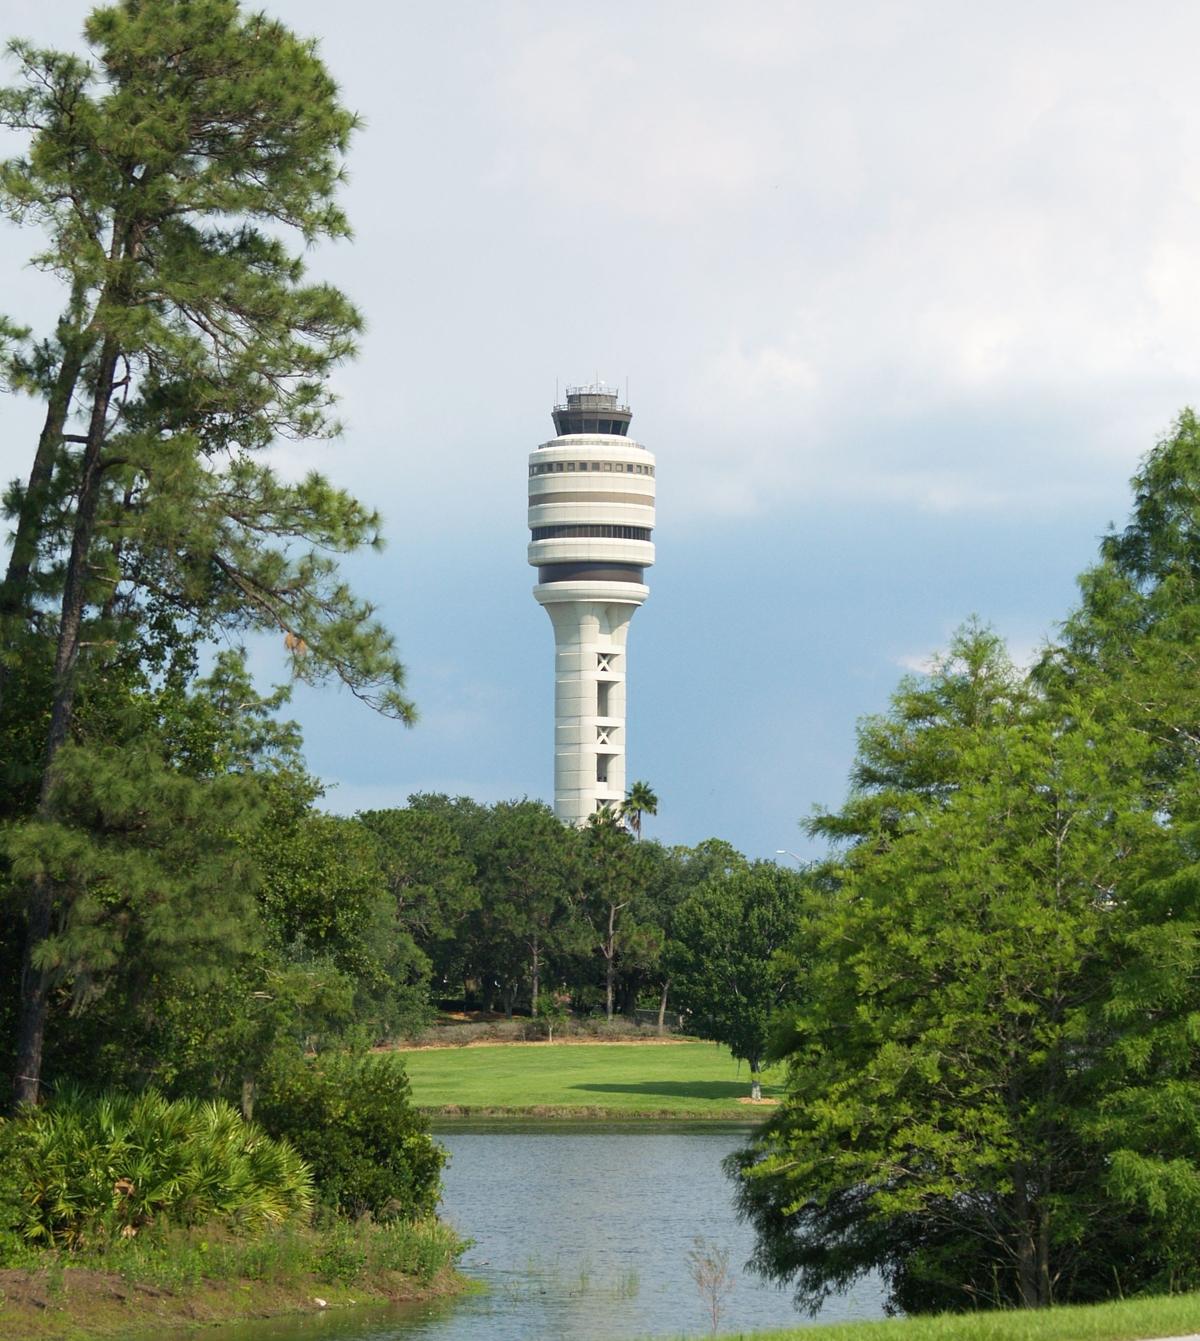 FAA Tower Across Lake